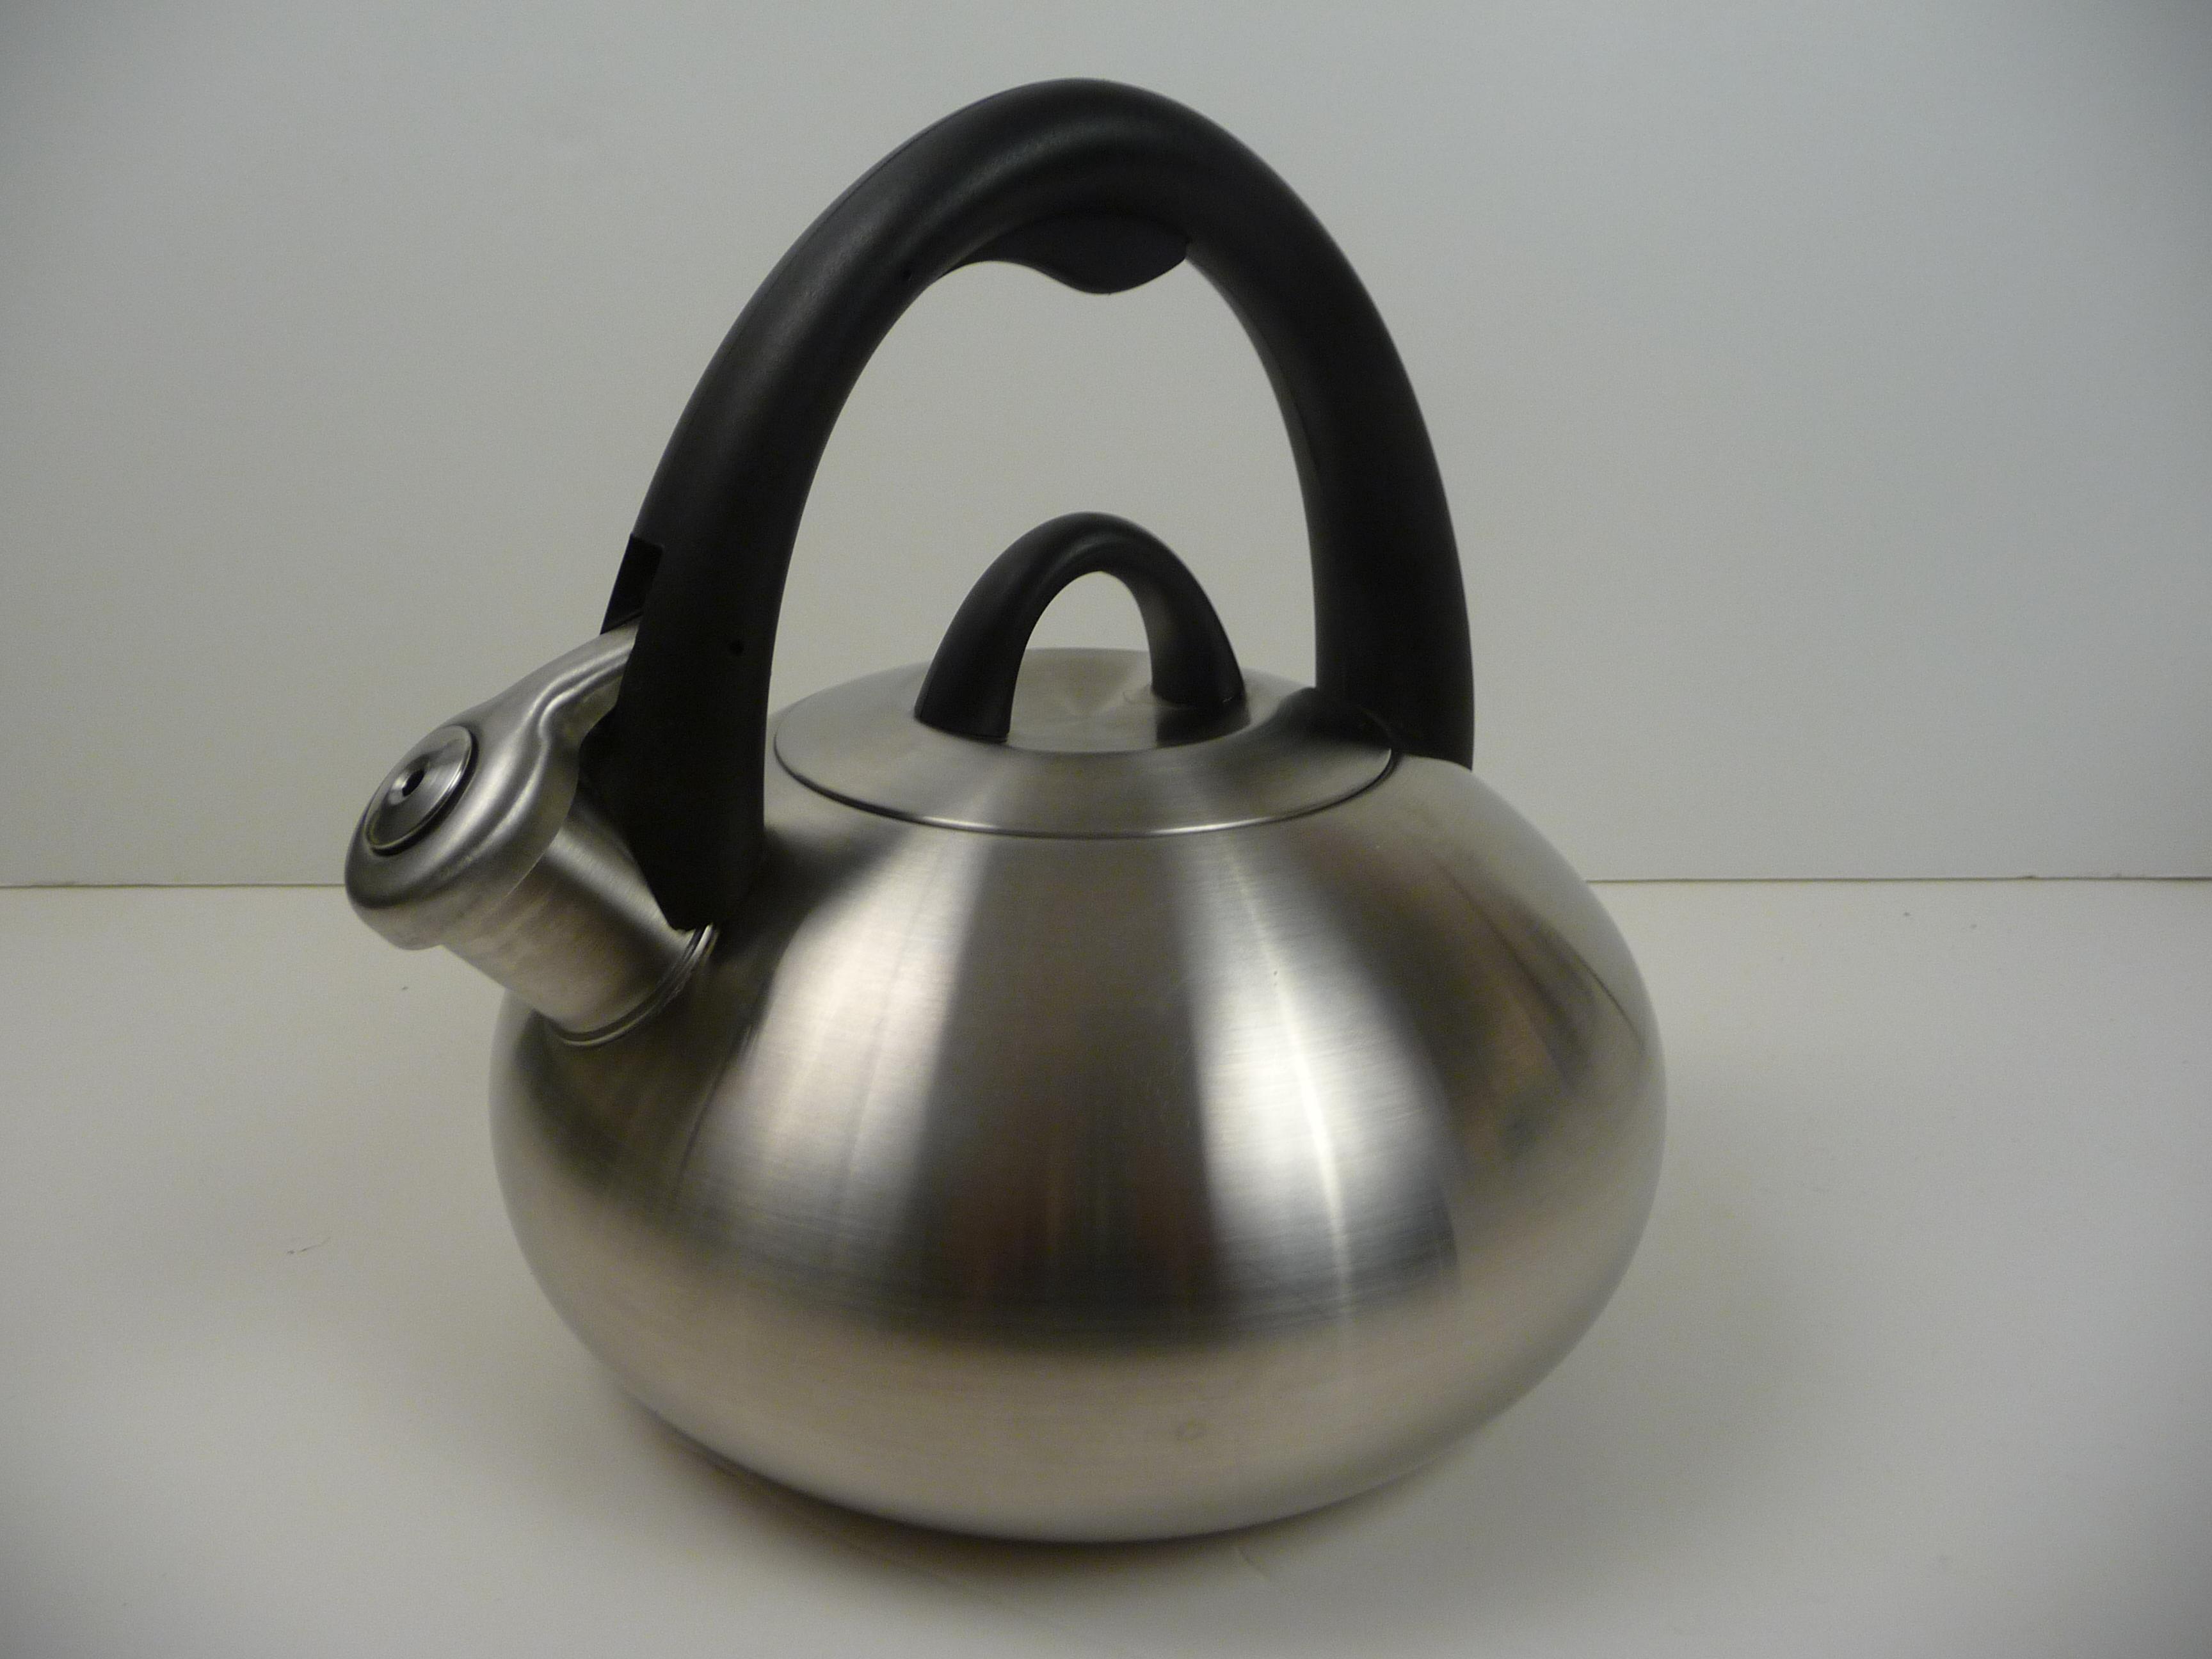 Best Teakettle – Calphalon – Stainless Steel Tea Kettle with Superior Human Design